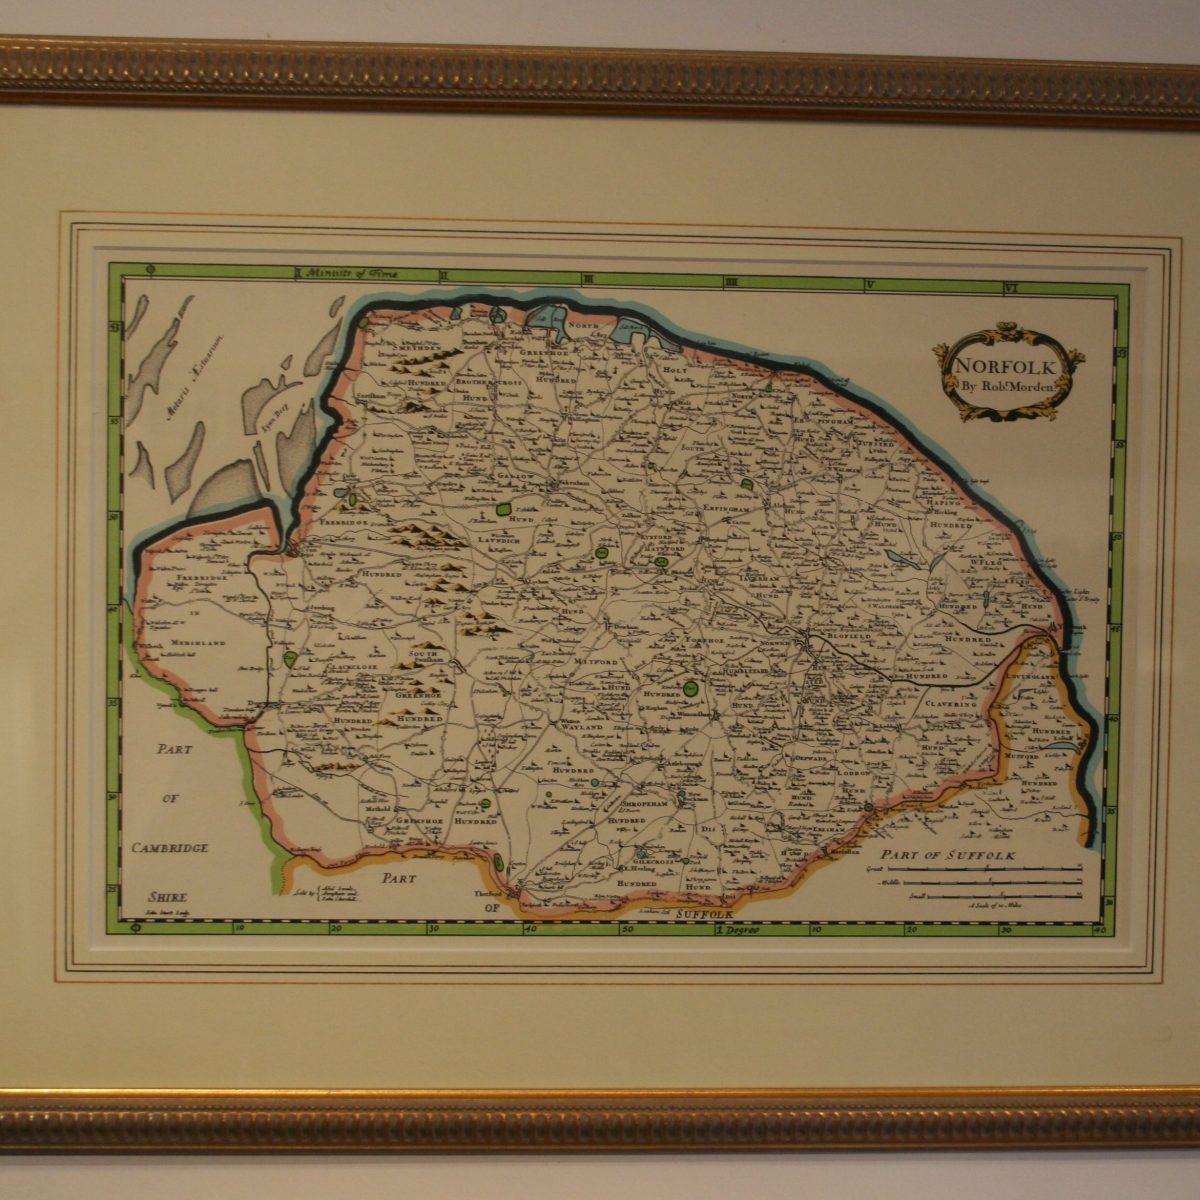 coloured print of Norfolk/williamsantiques